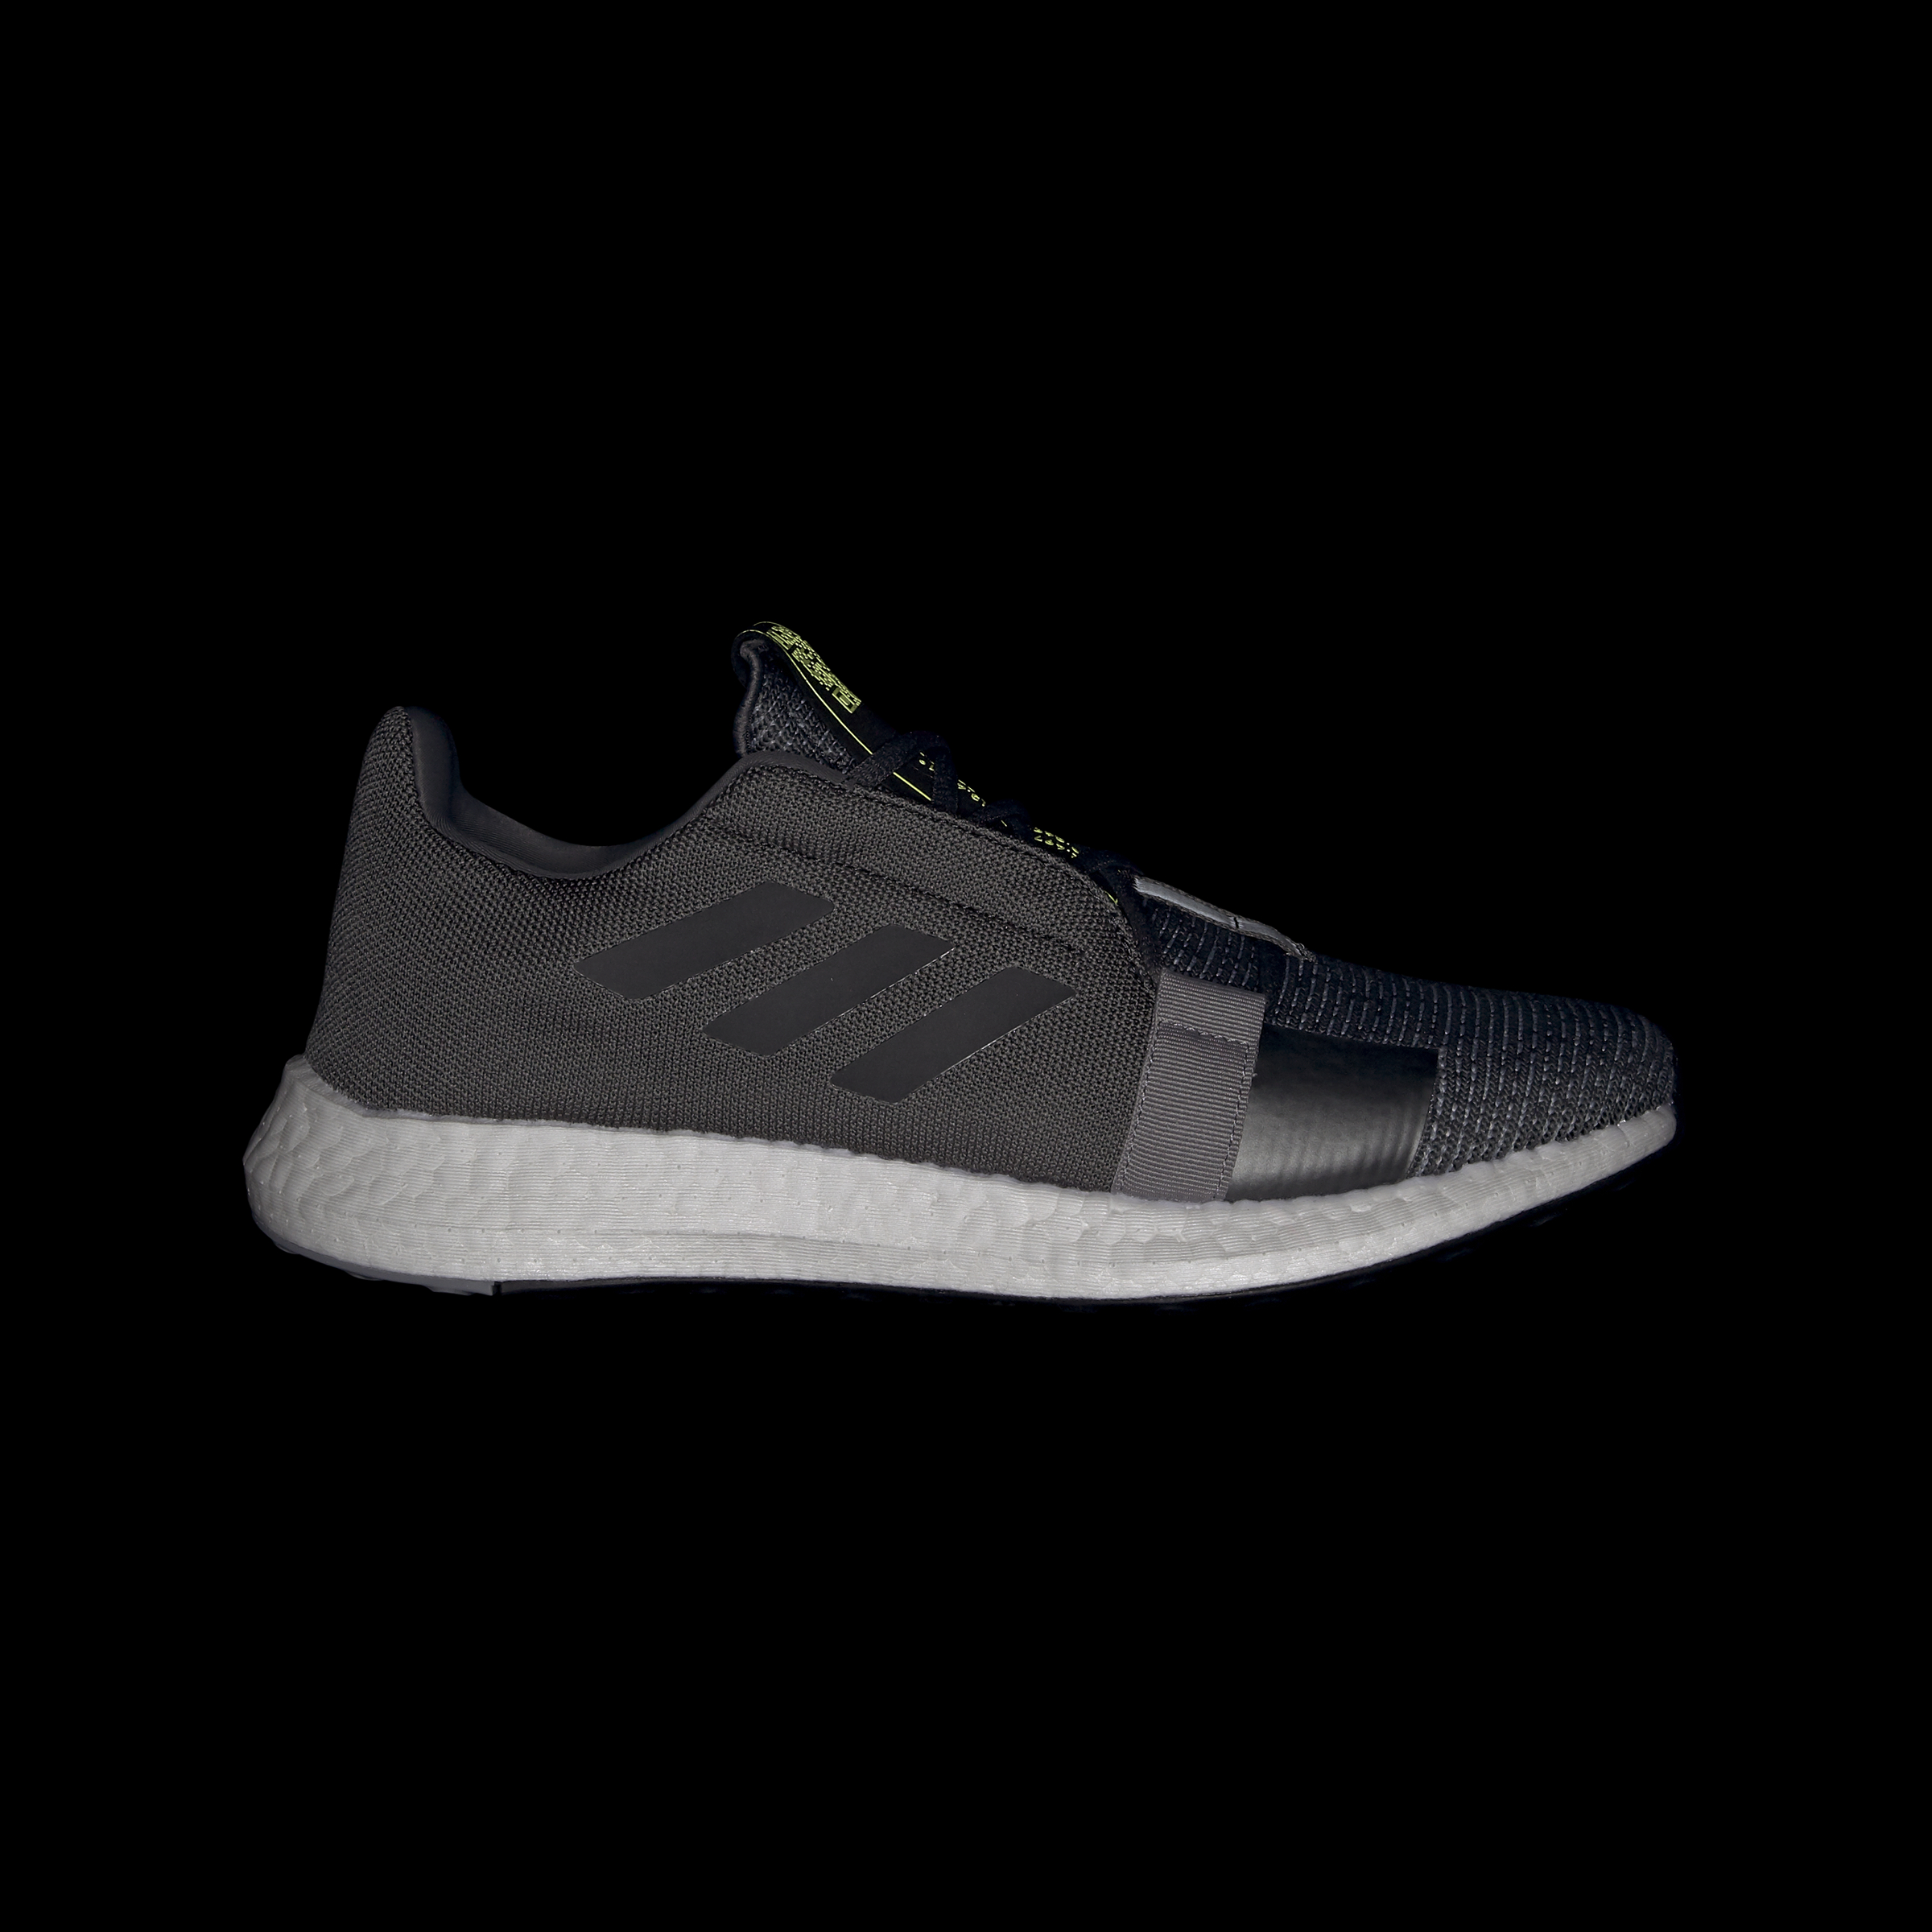 miniature 13 - adidas Senseboost Go Shoes Men's Athletic & Sneakers